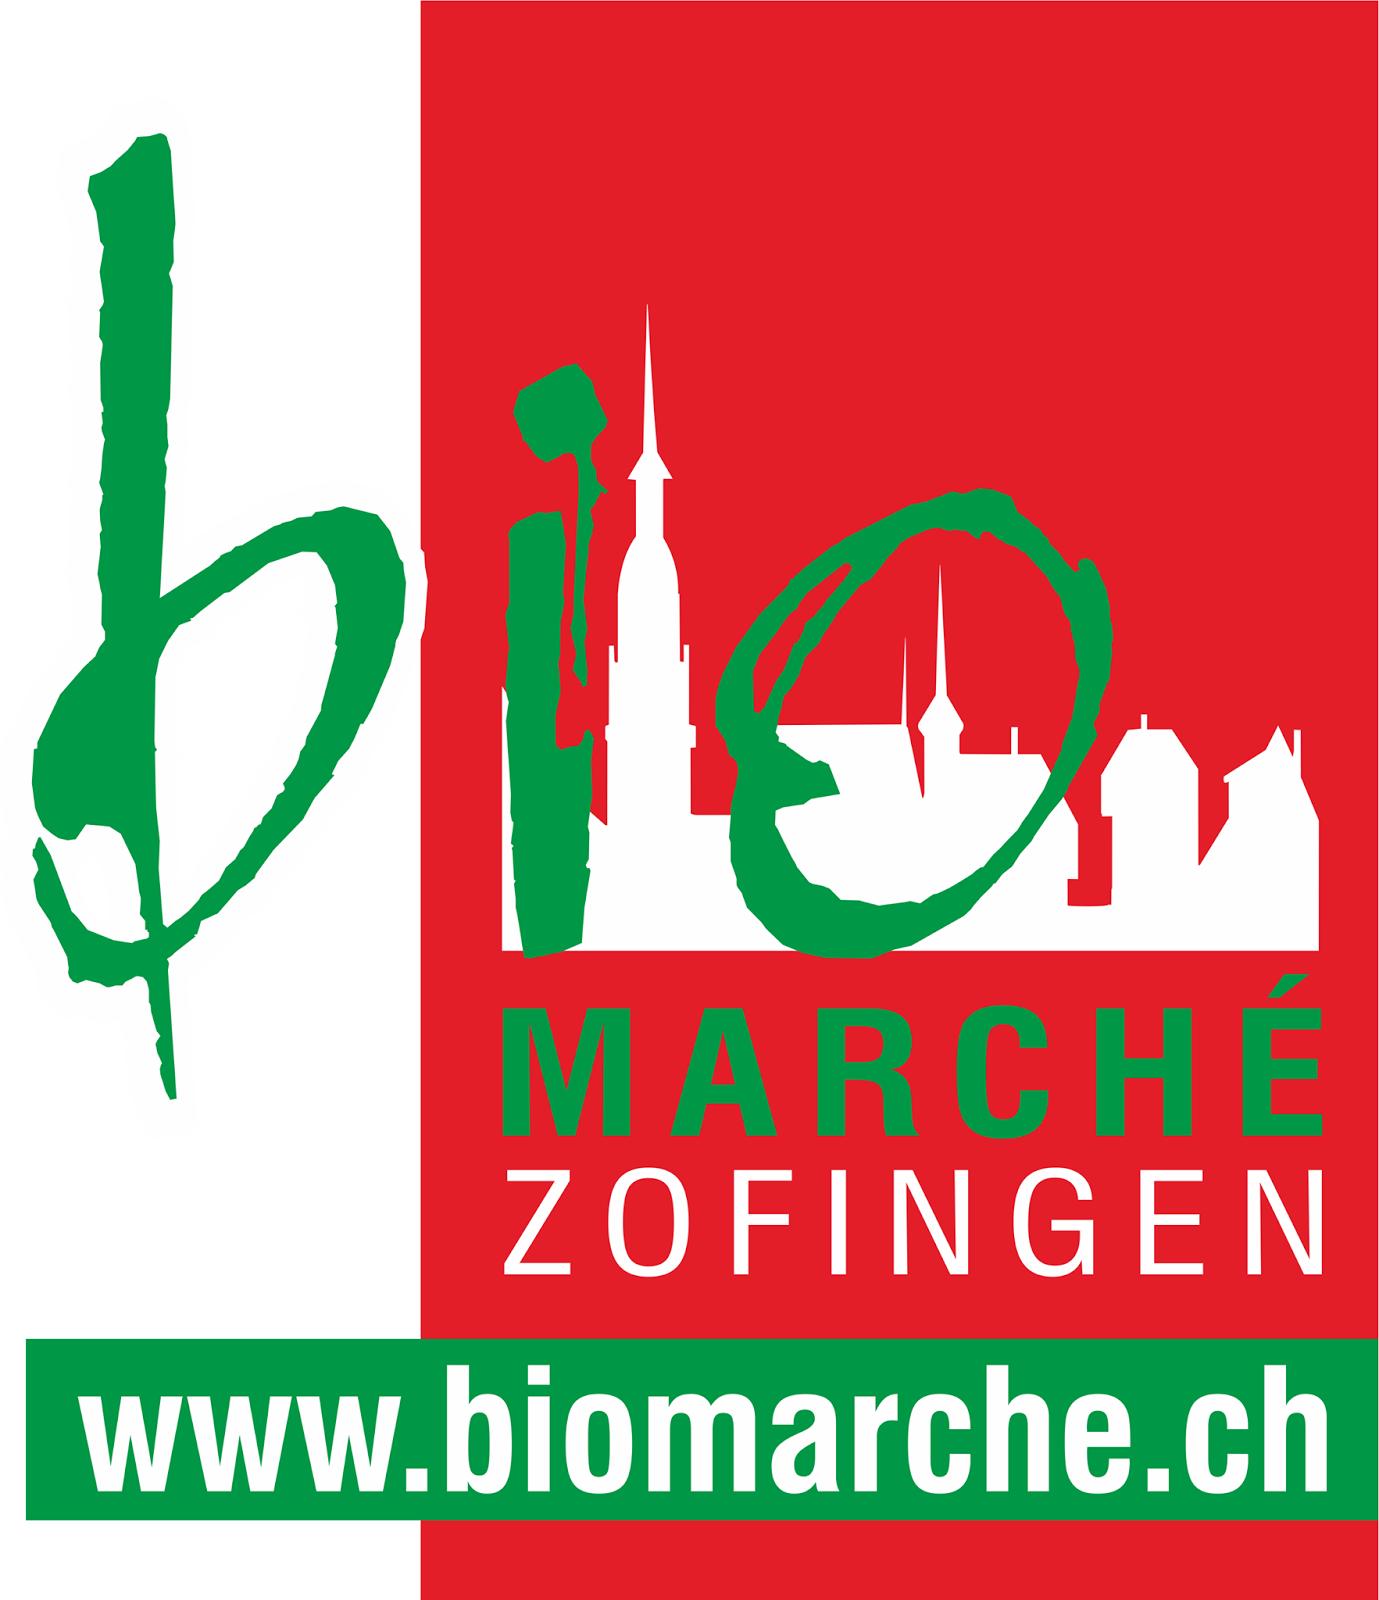 http://www.biomarche.ch